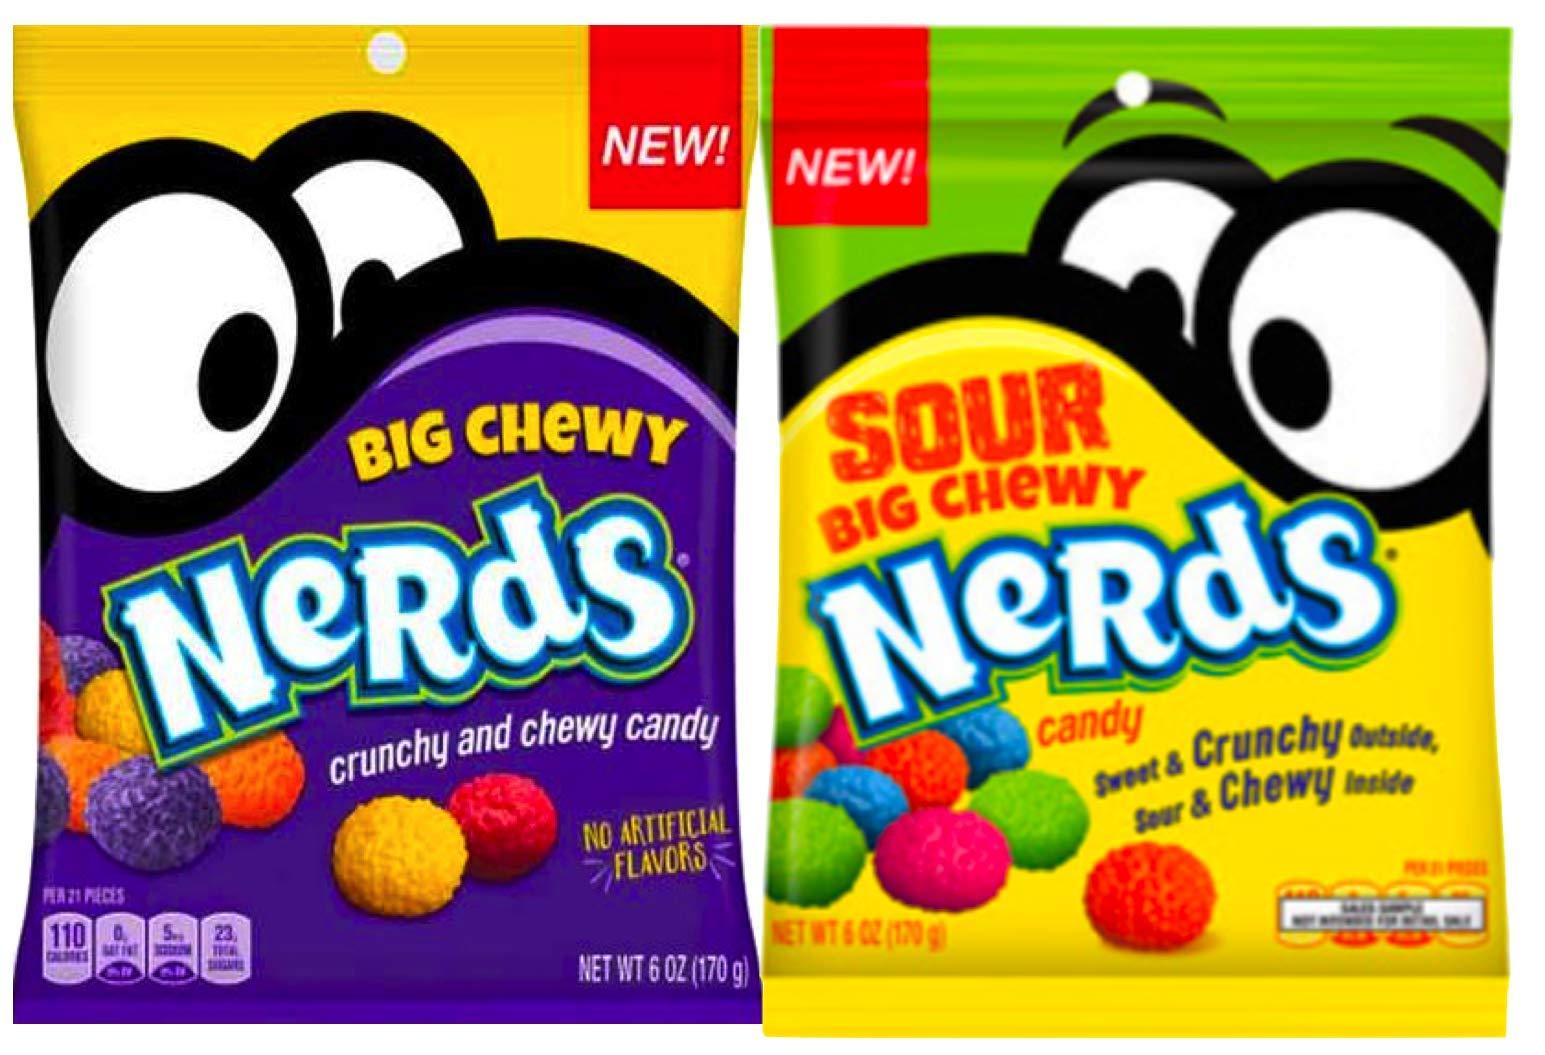 NEW Nerds Big Chewy Nerds Sour & Crunchy No Artificial Flavors Net WT 6oz (2)